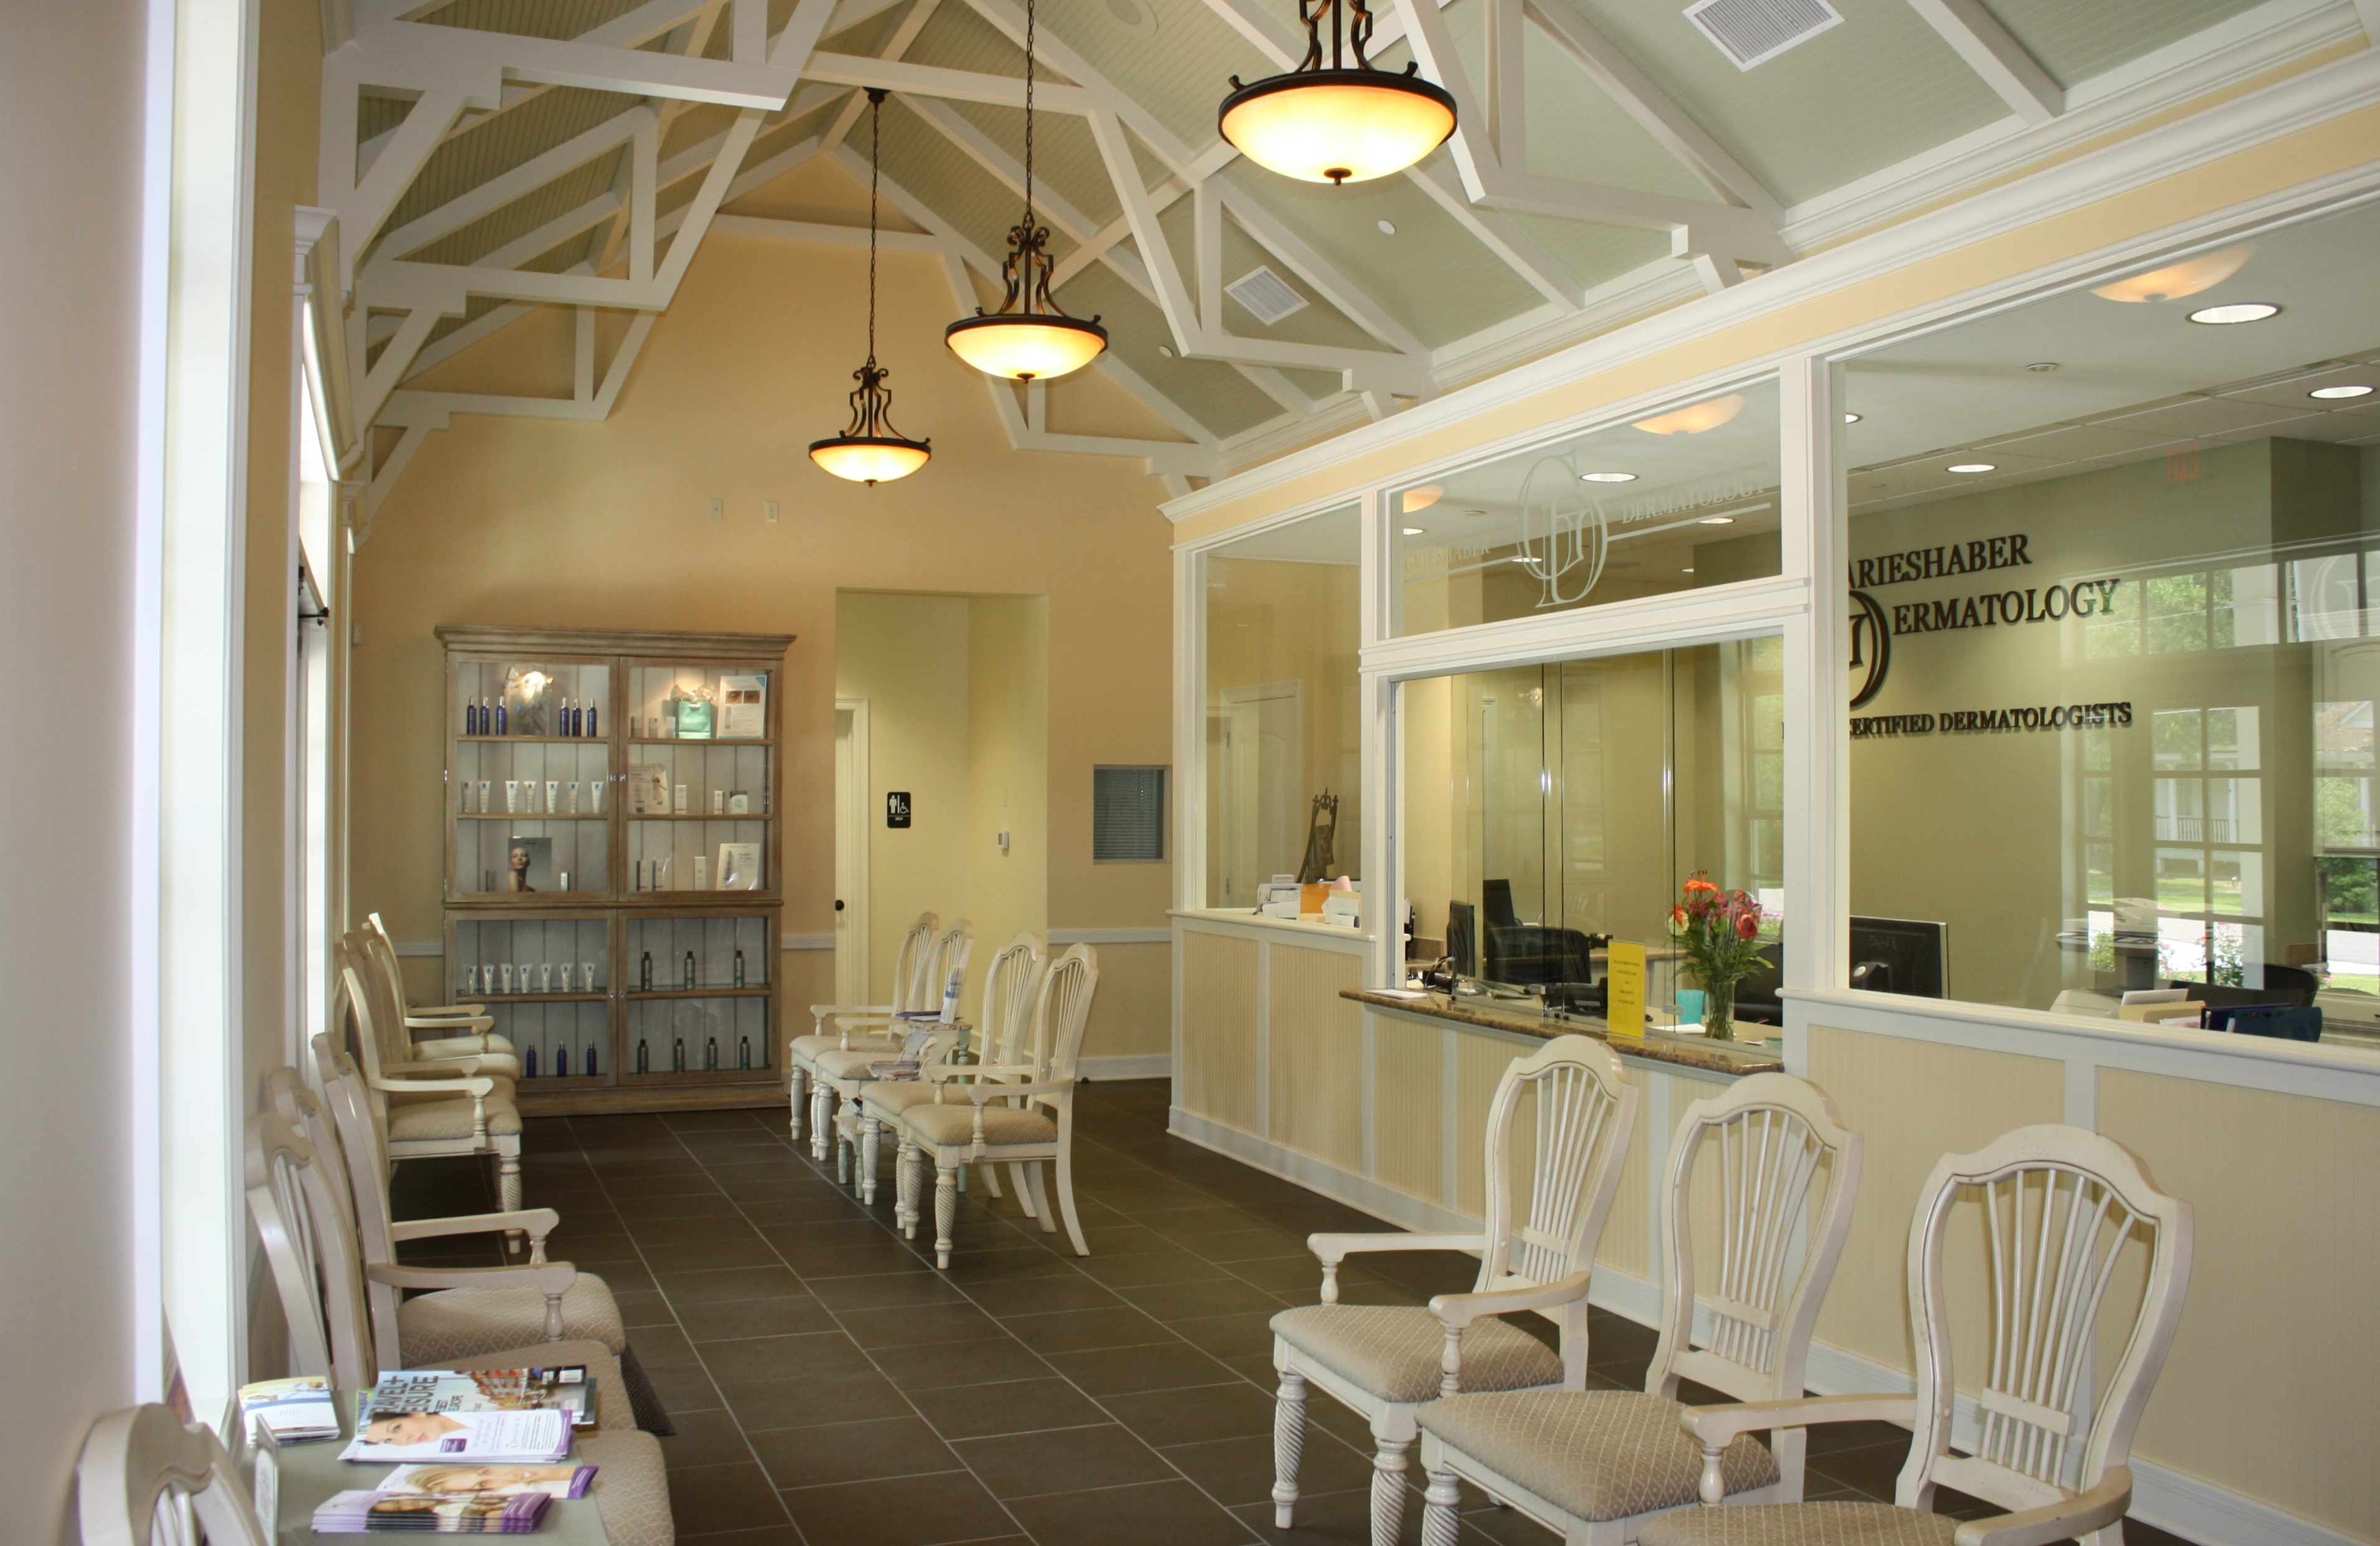 The Dermatology Clinic of ST Tammany Inc image 2